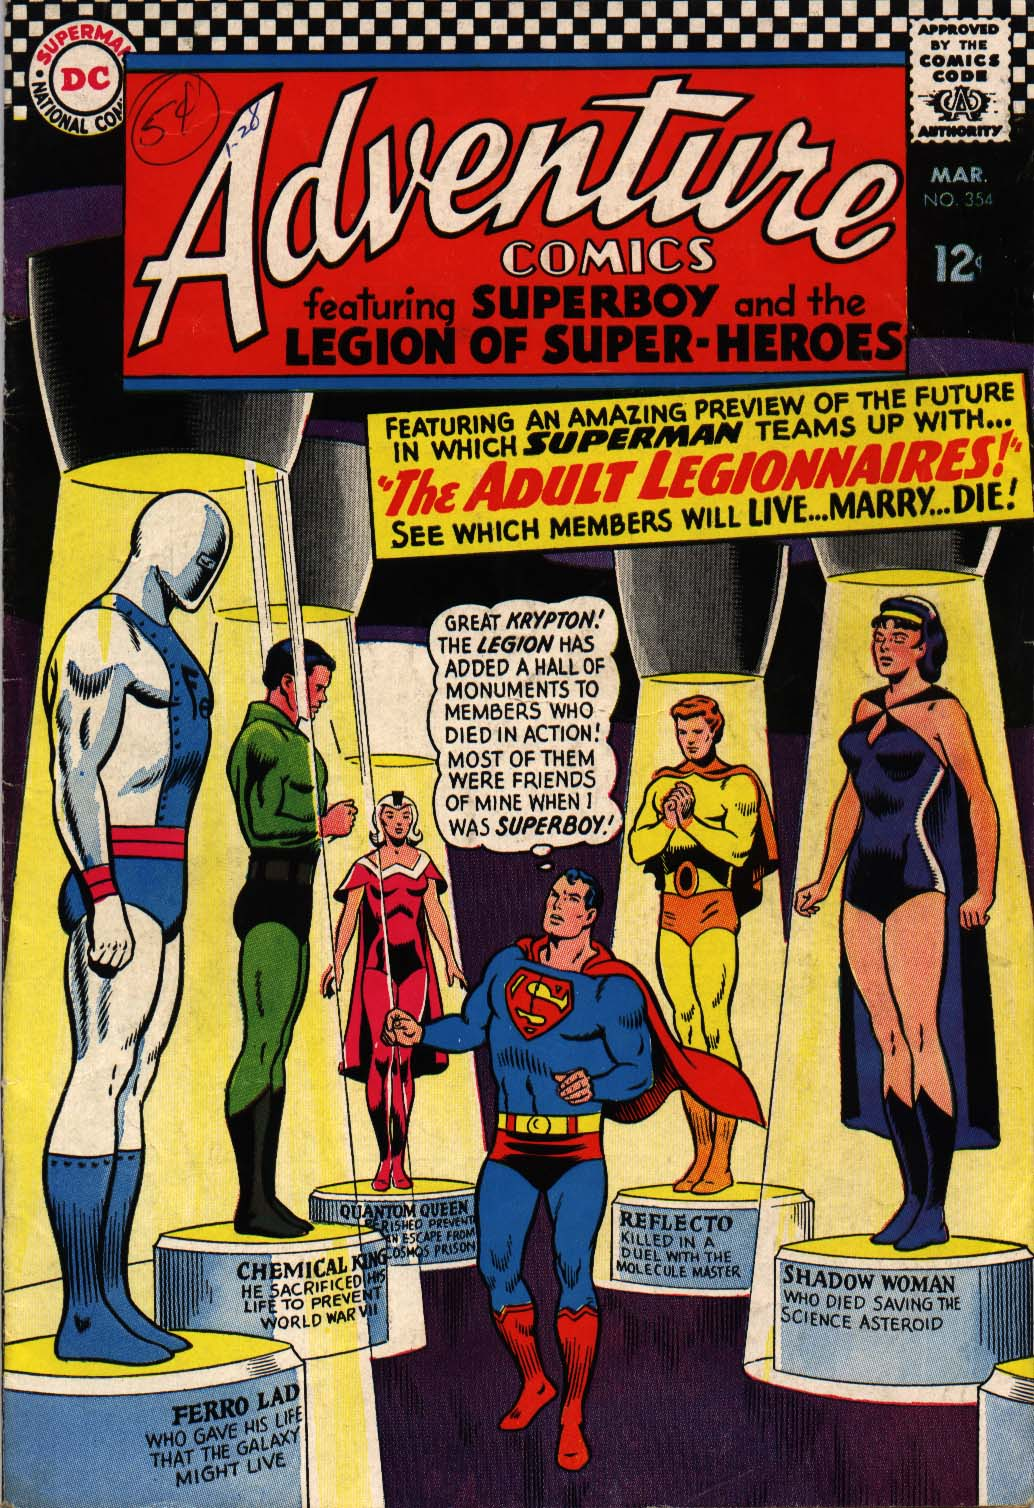 Adventure Comics # 354, March, 1967